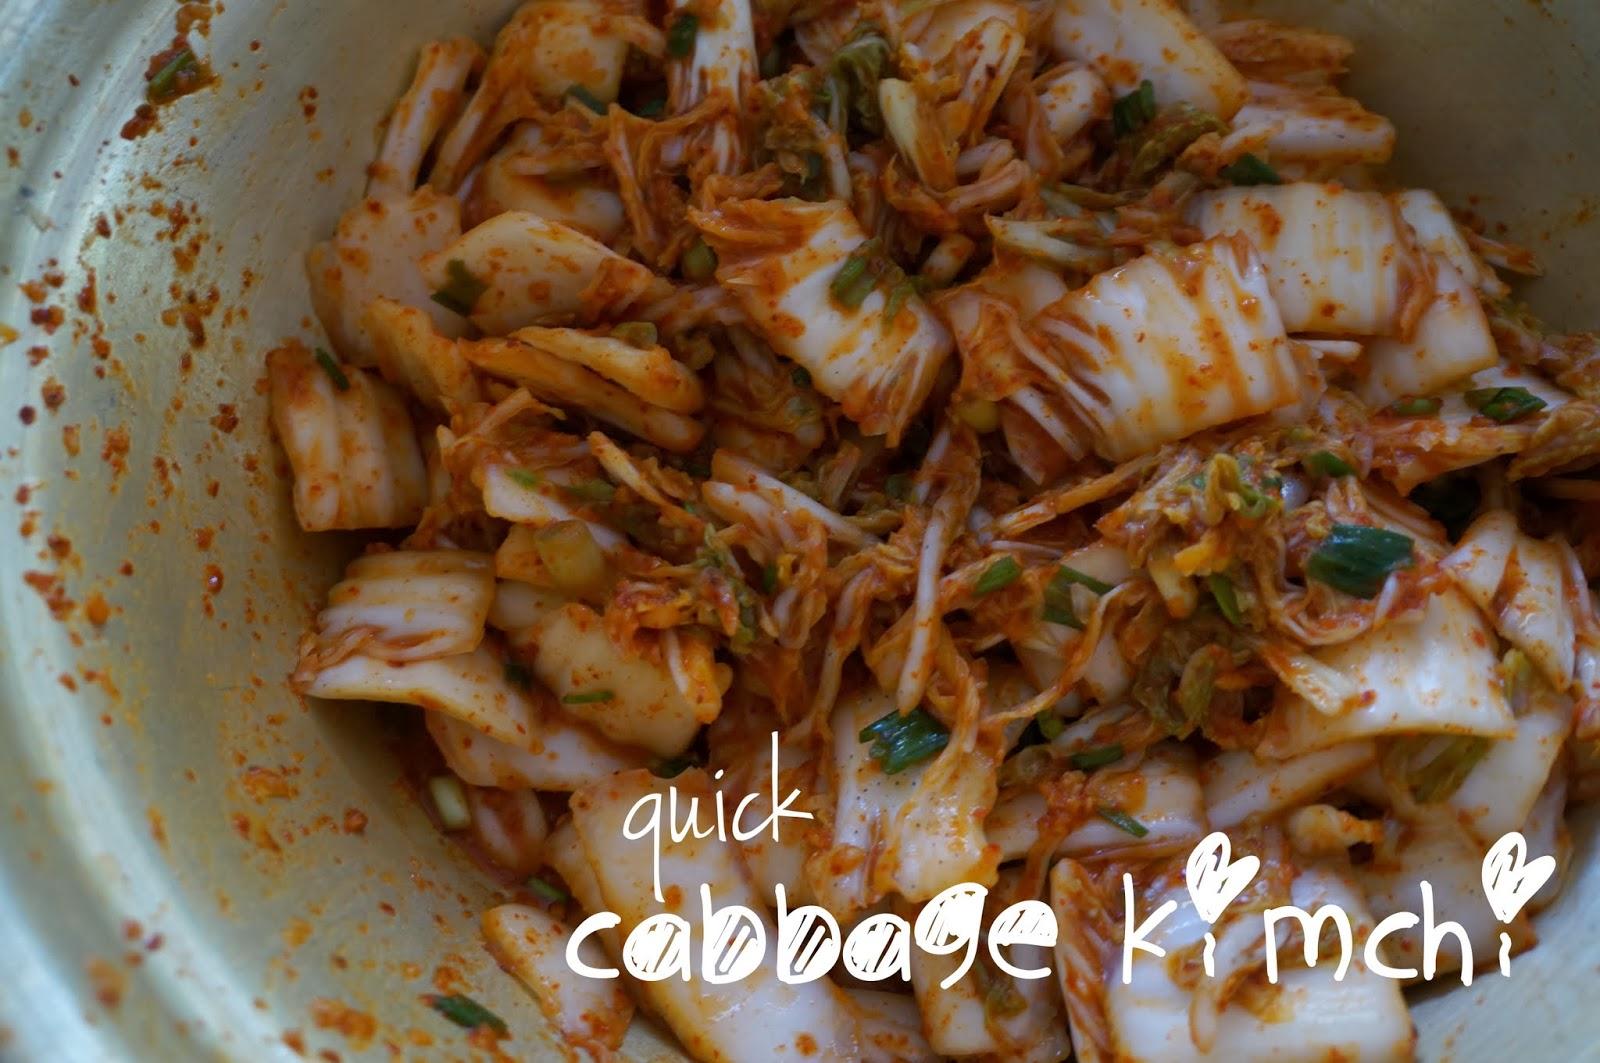 ... kimchi jjigae pork and kimchi stew basic napa cabbage kimchi kimchee